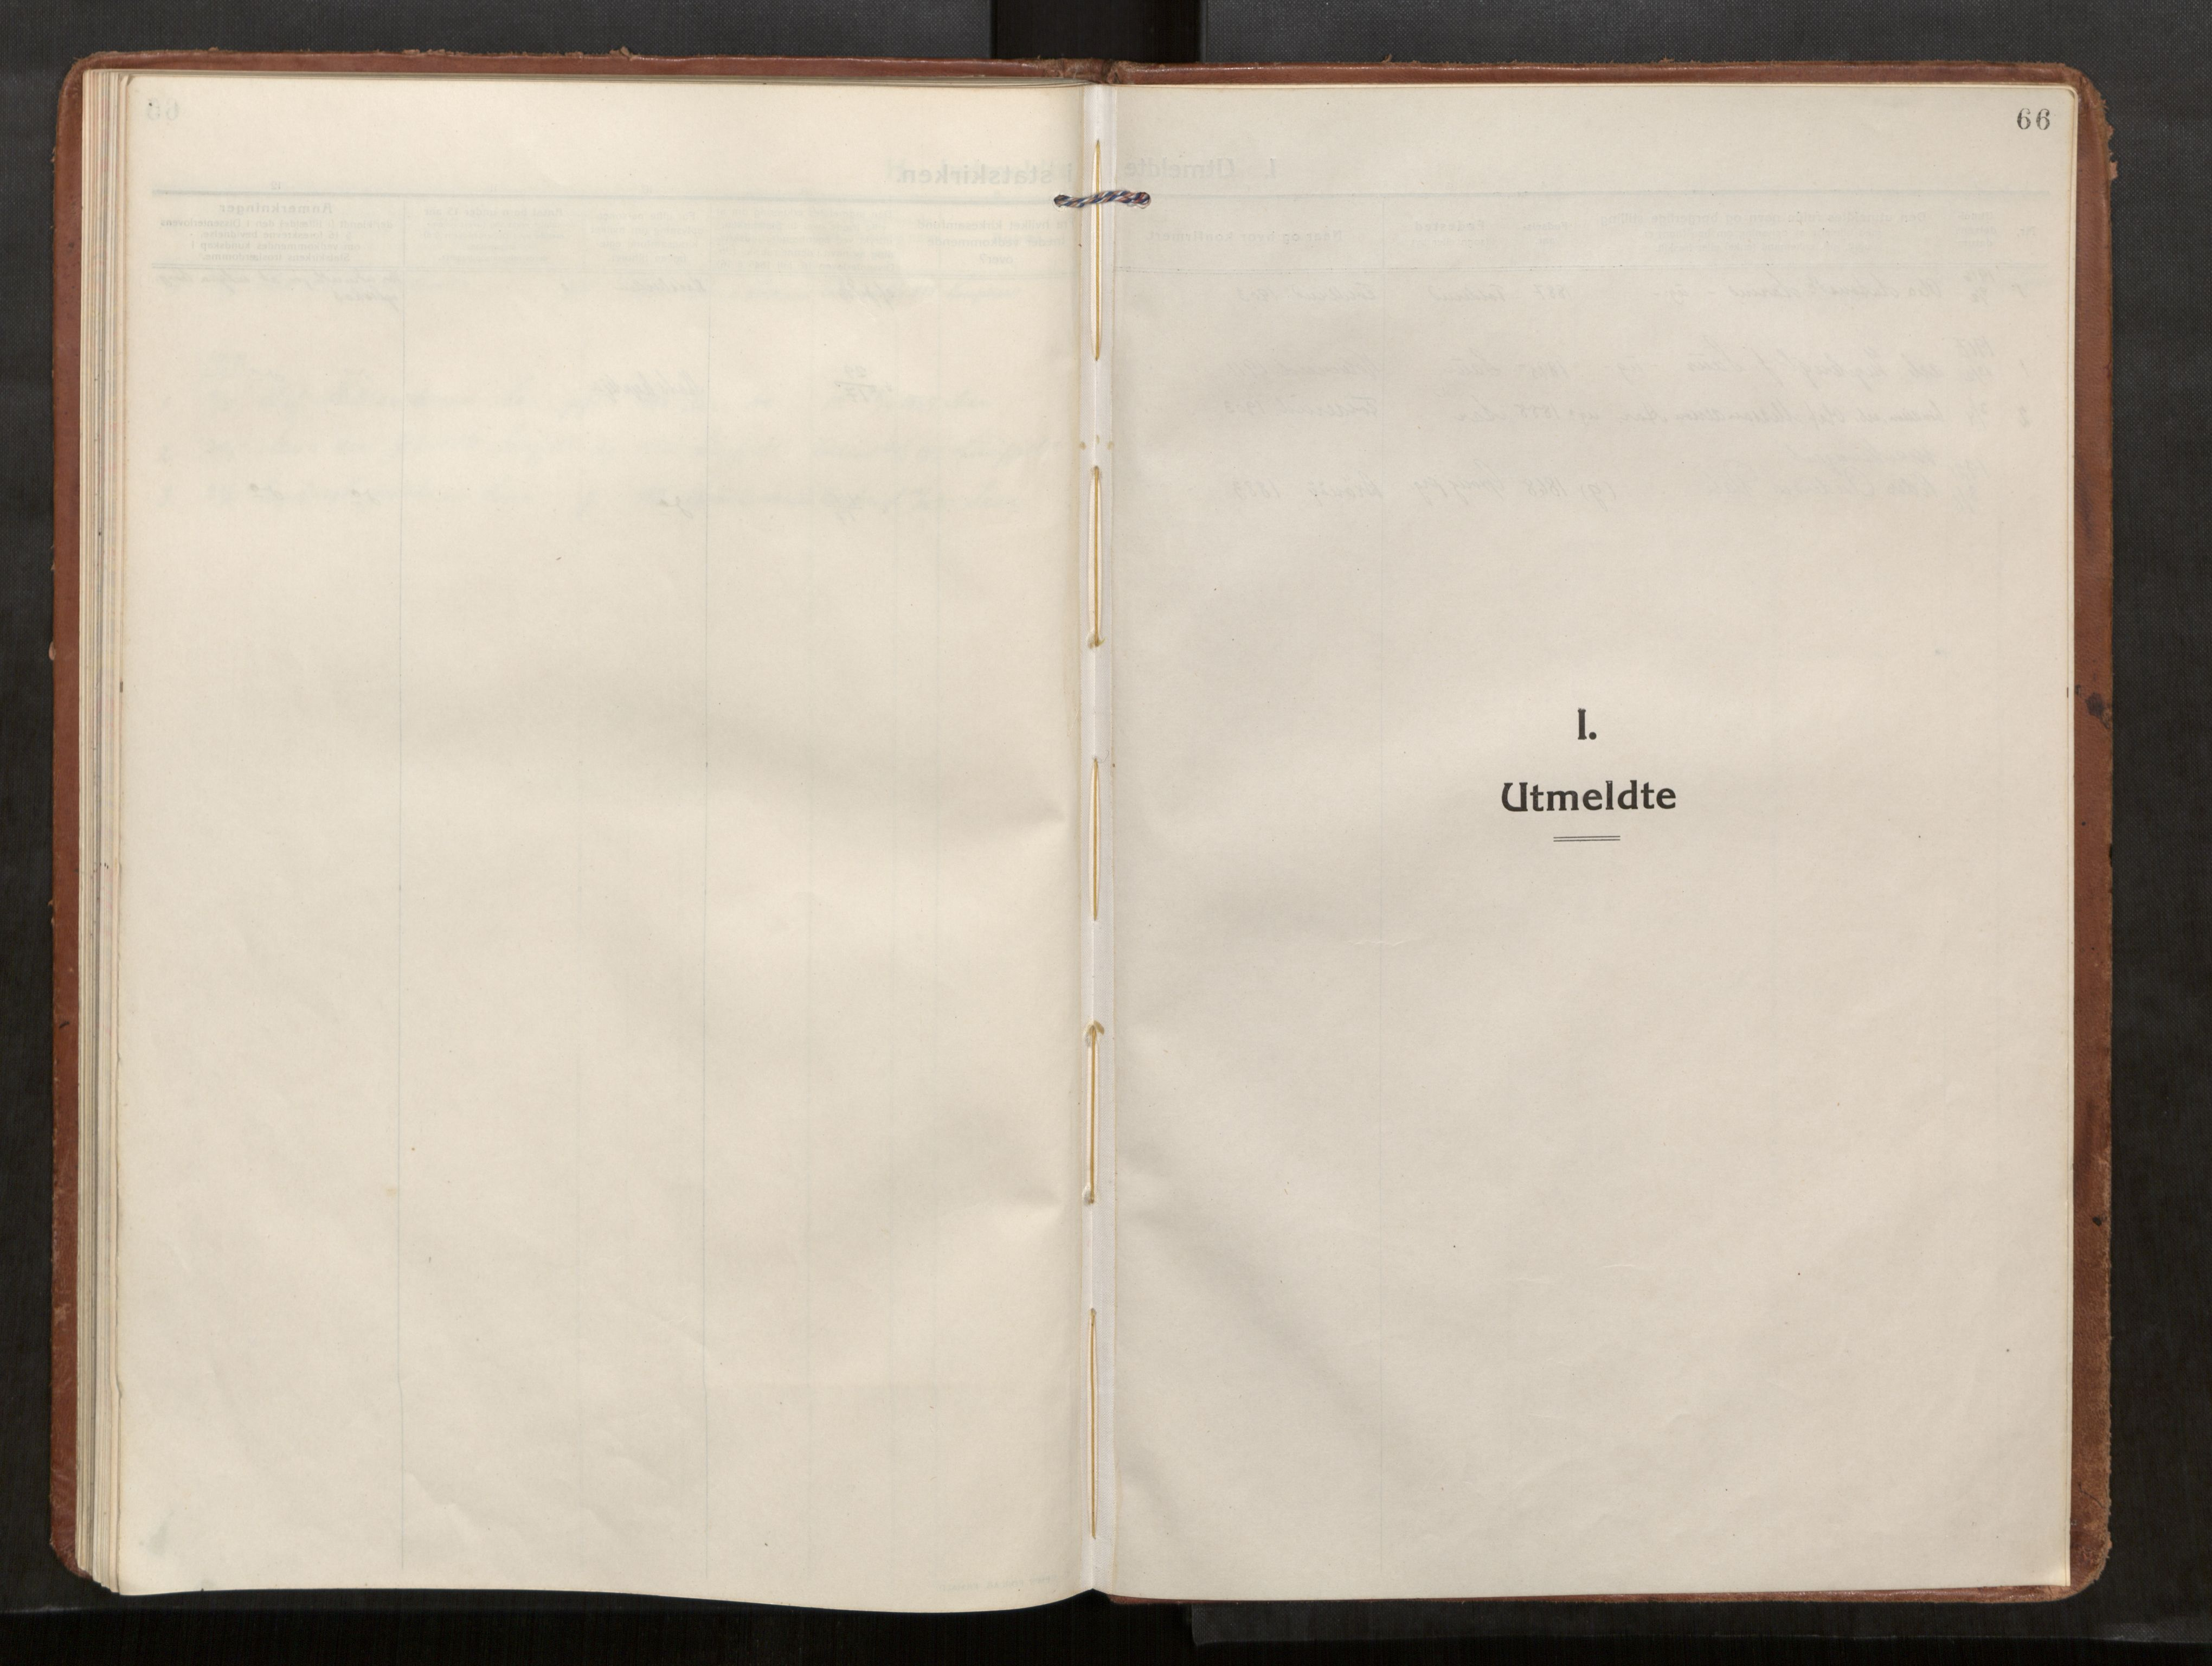 SAT, Kolvereid sokneprestkontor, H/Ha/Haa/L0002: Ministerialbok nr. 2, 1914-1926, s. 66